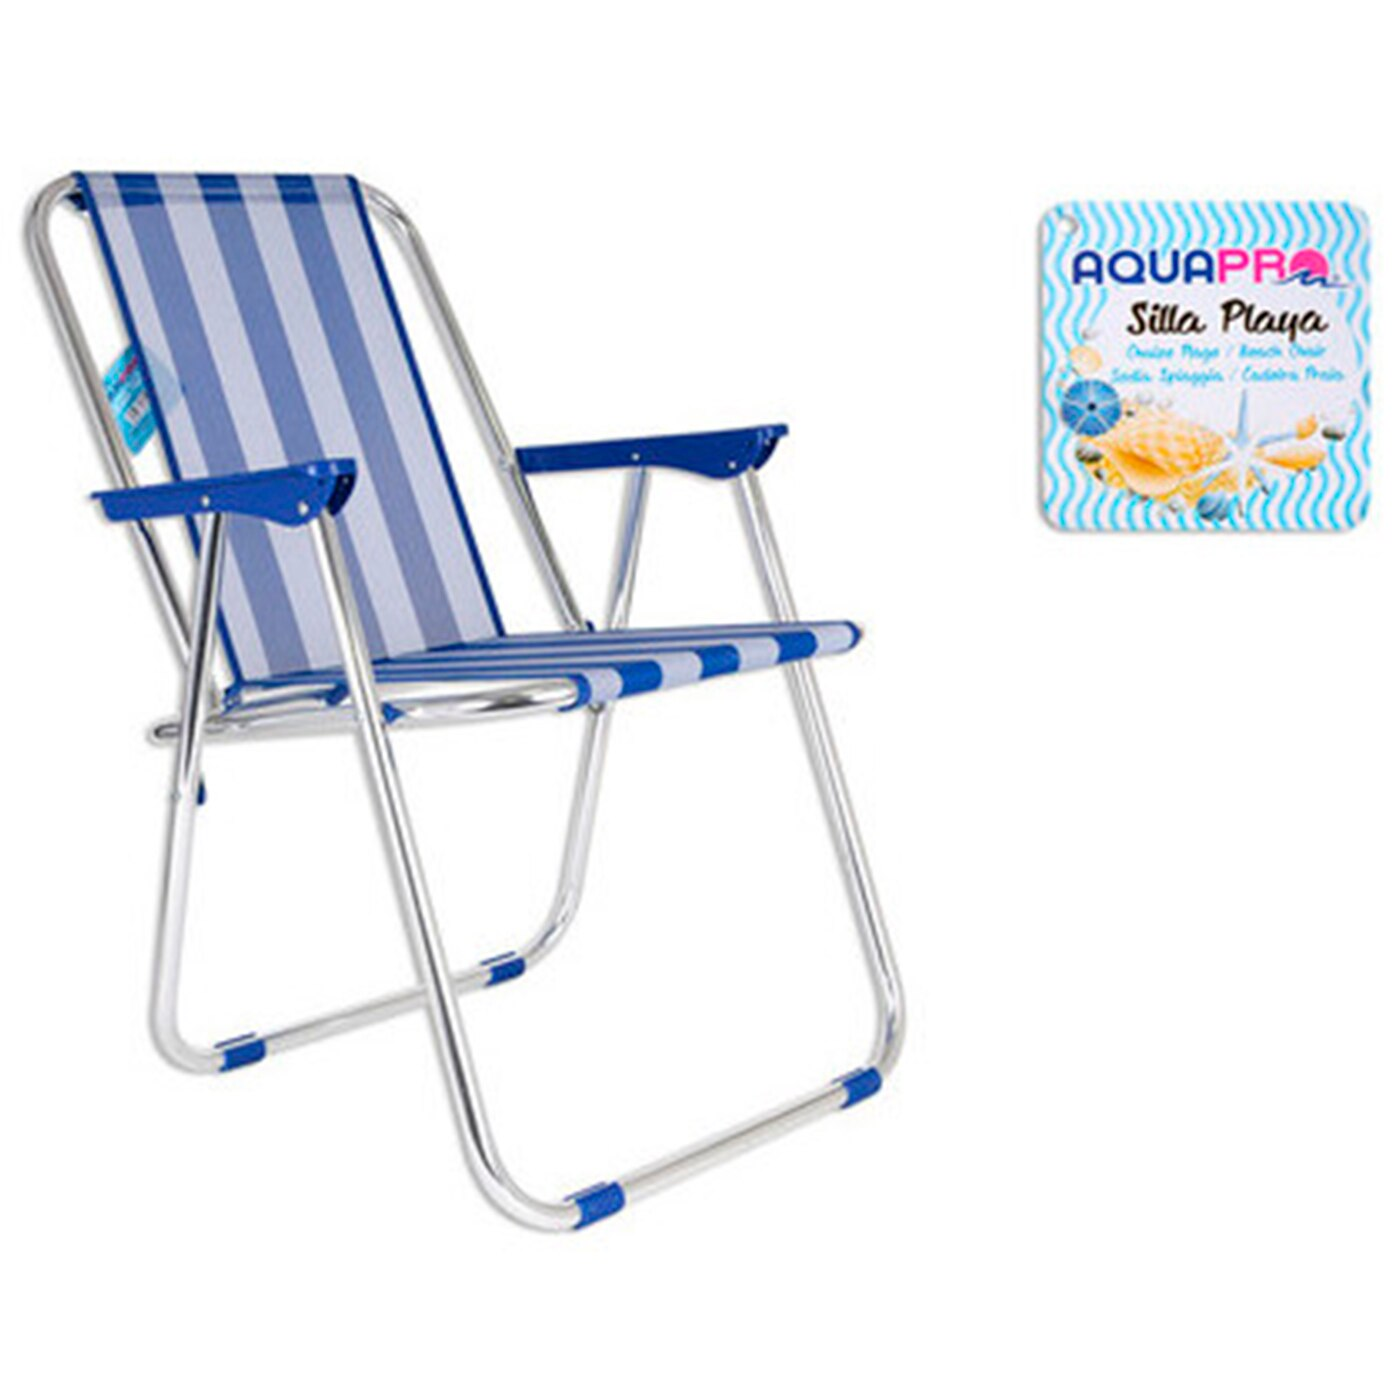 Beach chair aluminum with blue stripes